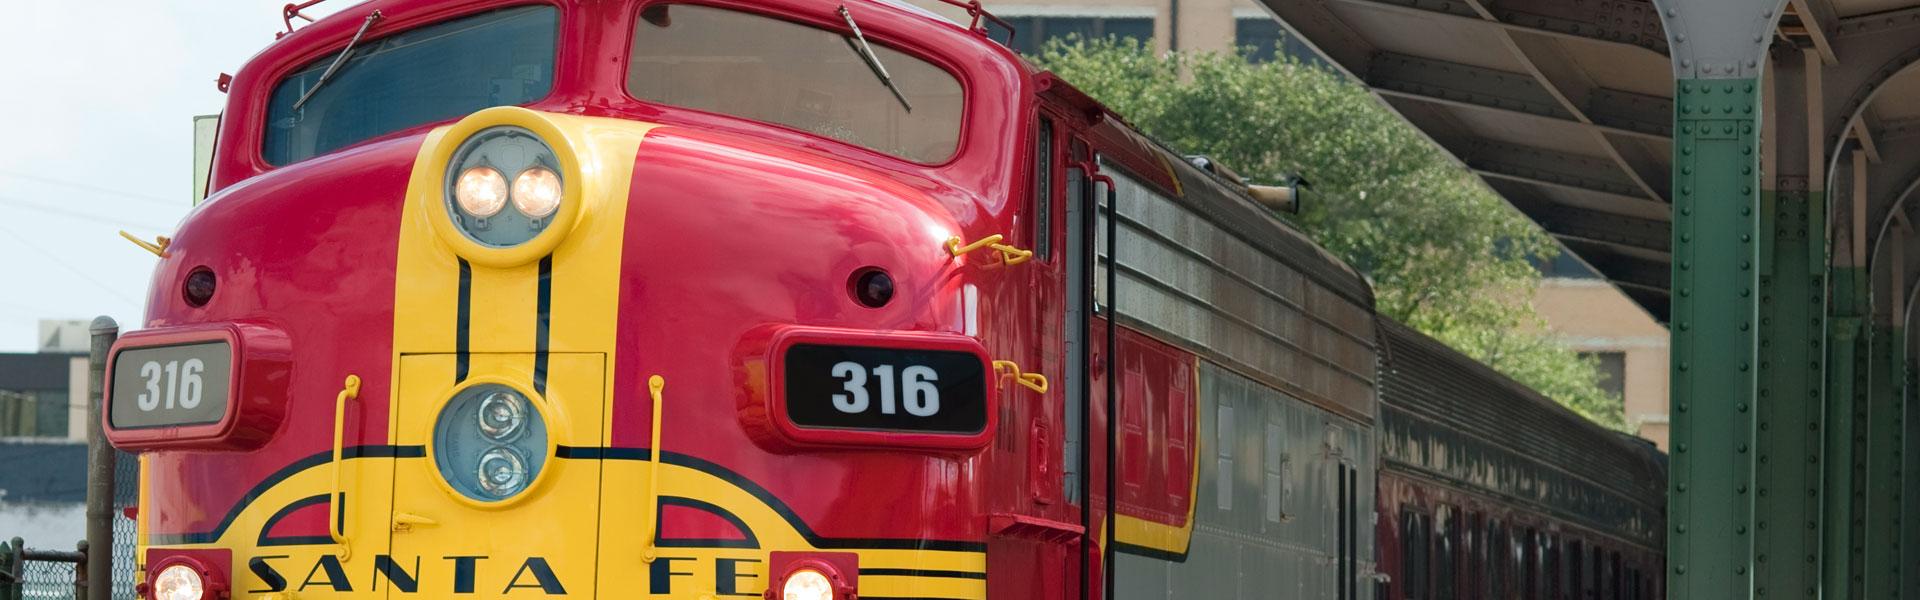 Train on Display at Galveston Railroad Museum